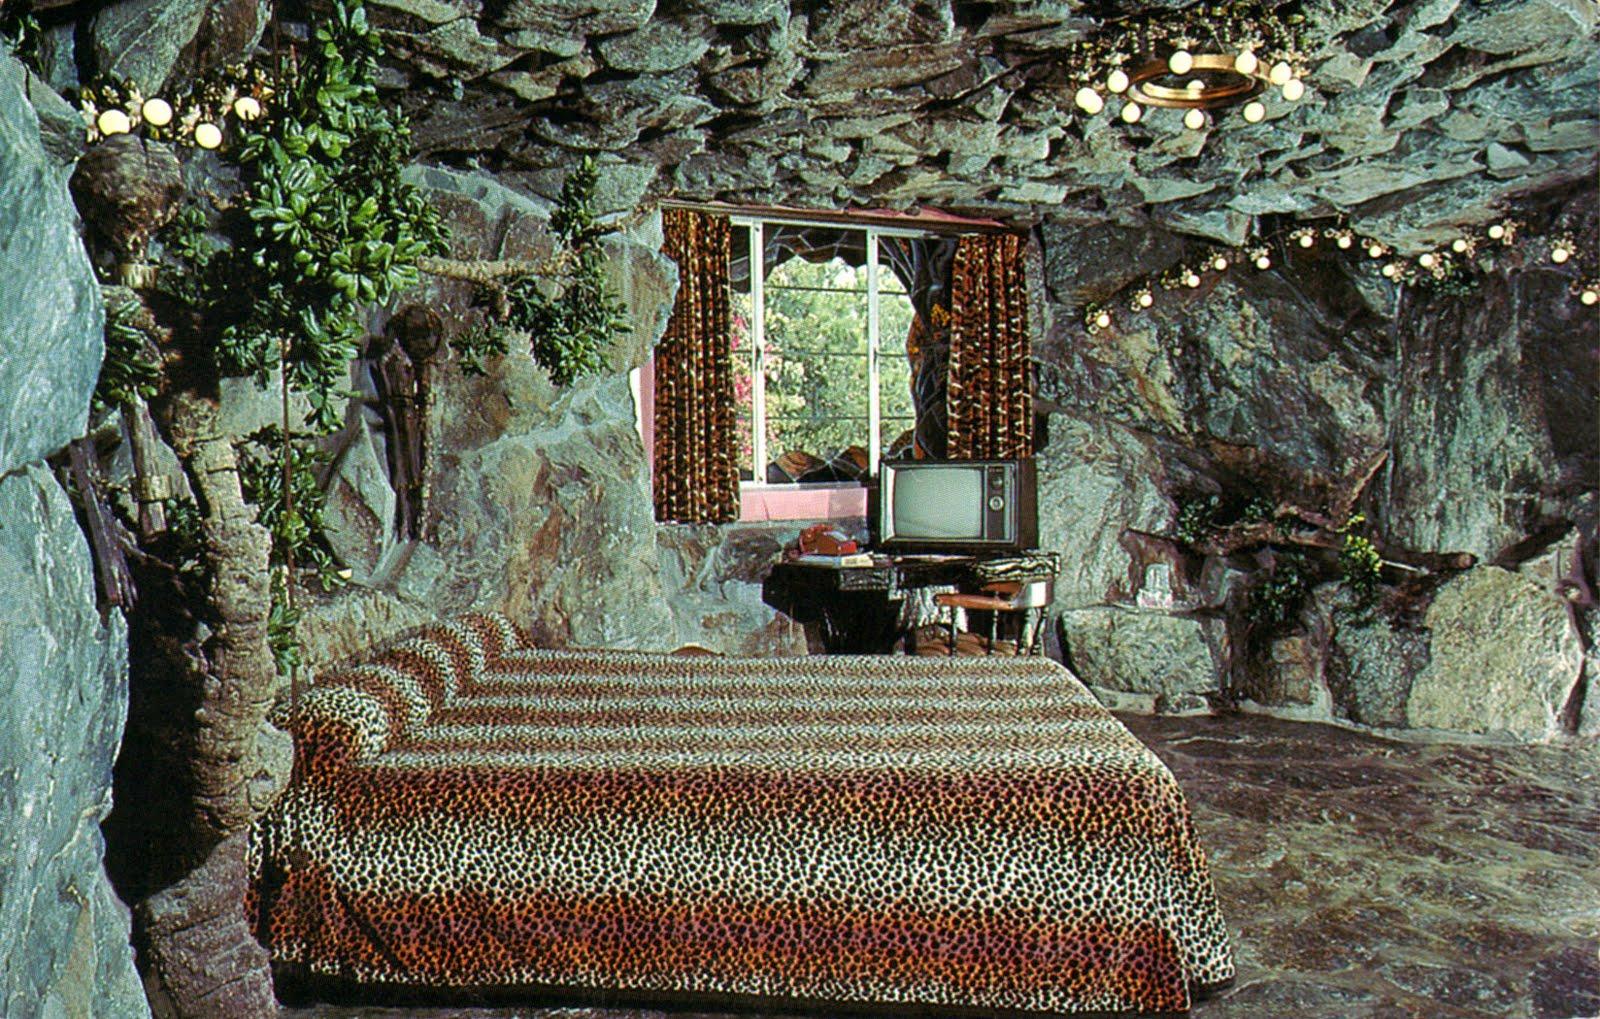 http://3.bp.blogspot.com/_i90_v6awmPA/S_BrUIy4YoI/AAAAAAAAA6I/Yi5s2rsCY3w/s1600/madonna_inn_room137_cave_man_room_san_luis_obispo_CA.jpg